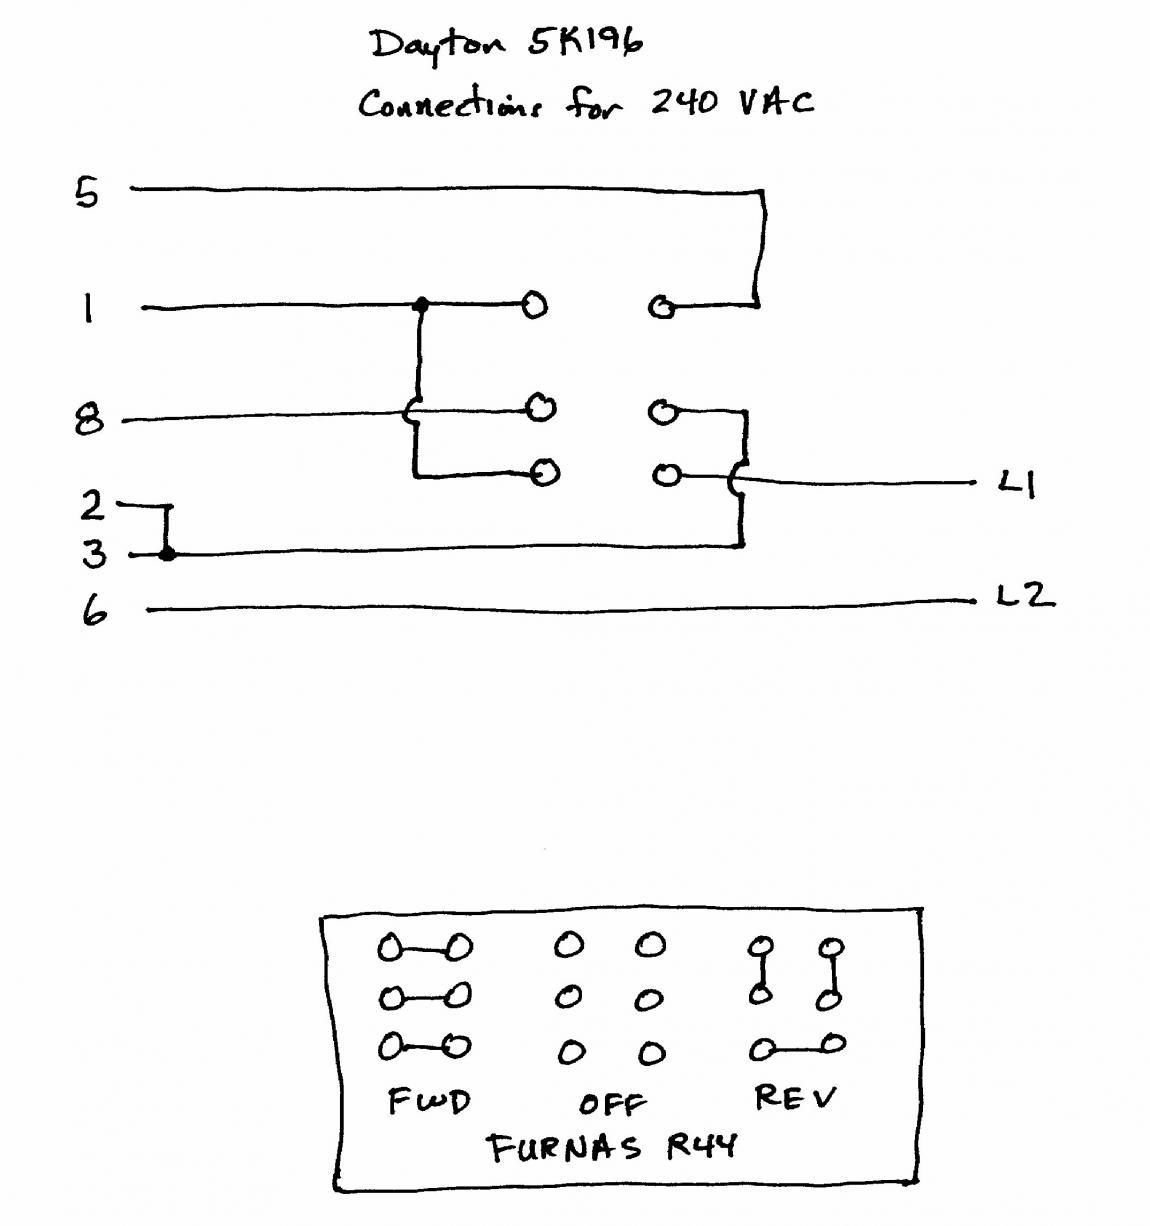 mf_7967] furnas r44 drum switch wiring diagram  pead inkl over gritea nizat lline rele mohammedshrine librar wiring 101